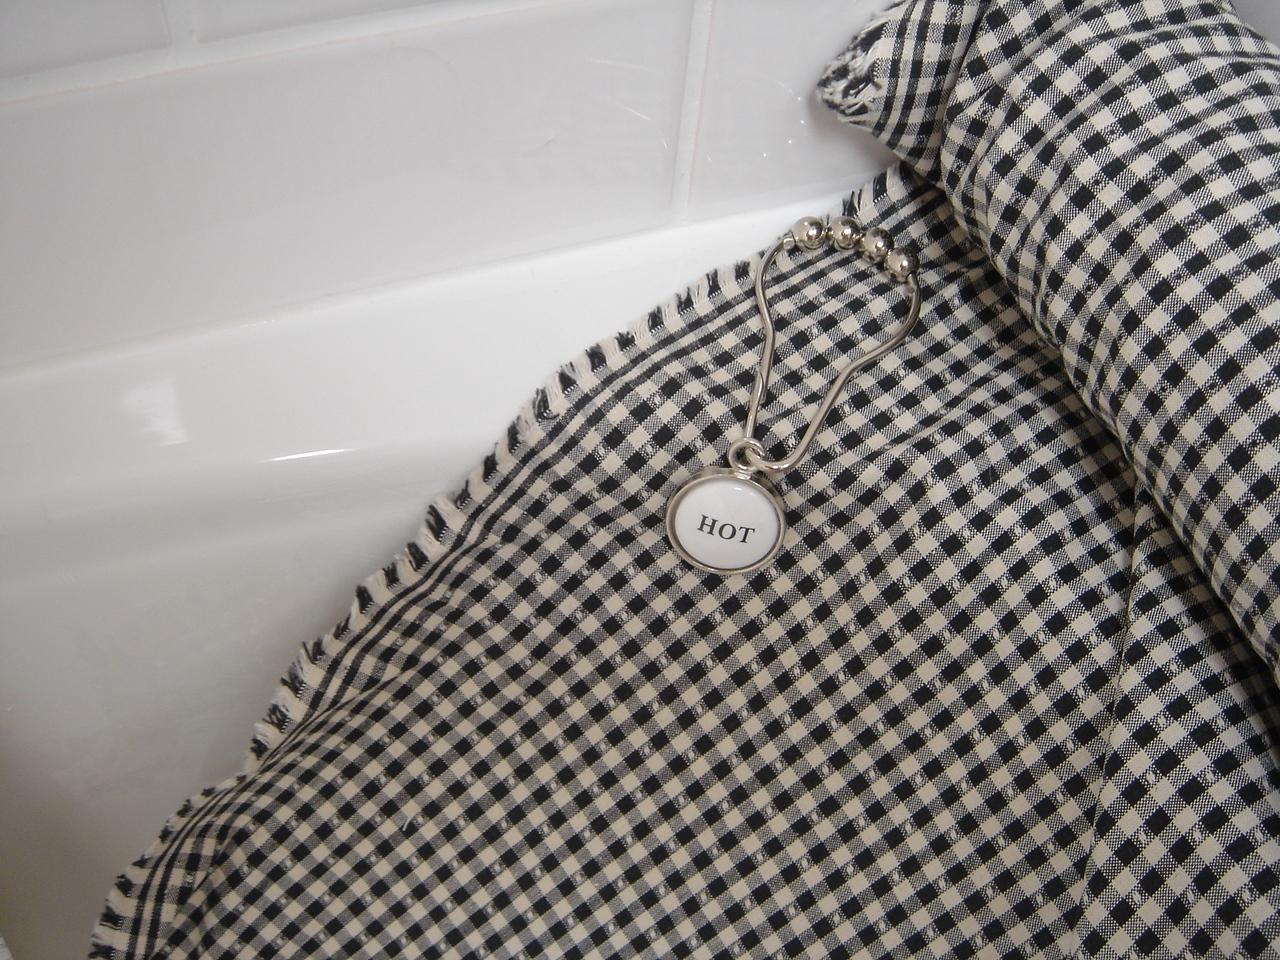 Shower curtain fabric, closeup; hook